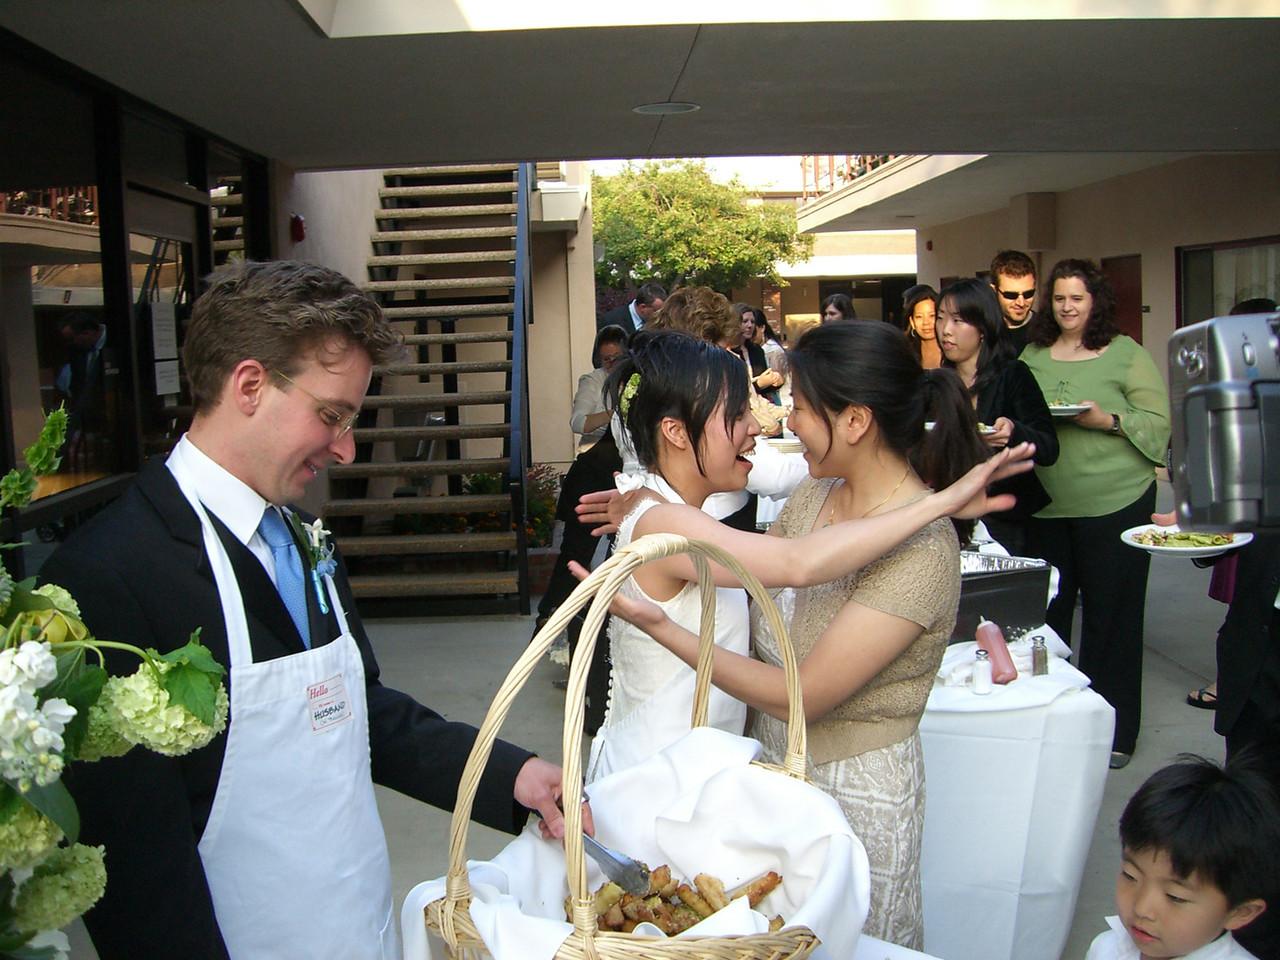 2006 05 06 Sat - Isabel Hunter & Angela Chen embrace as hubby Tim serves